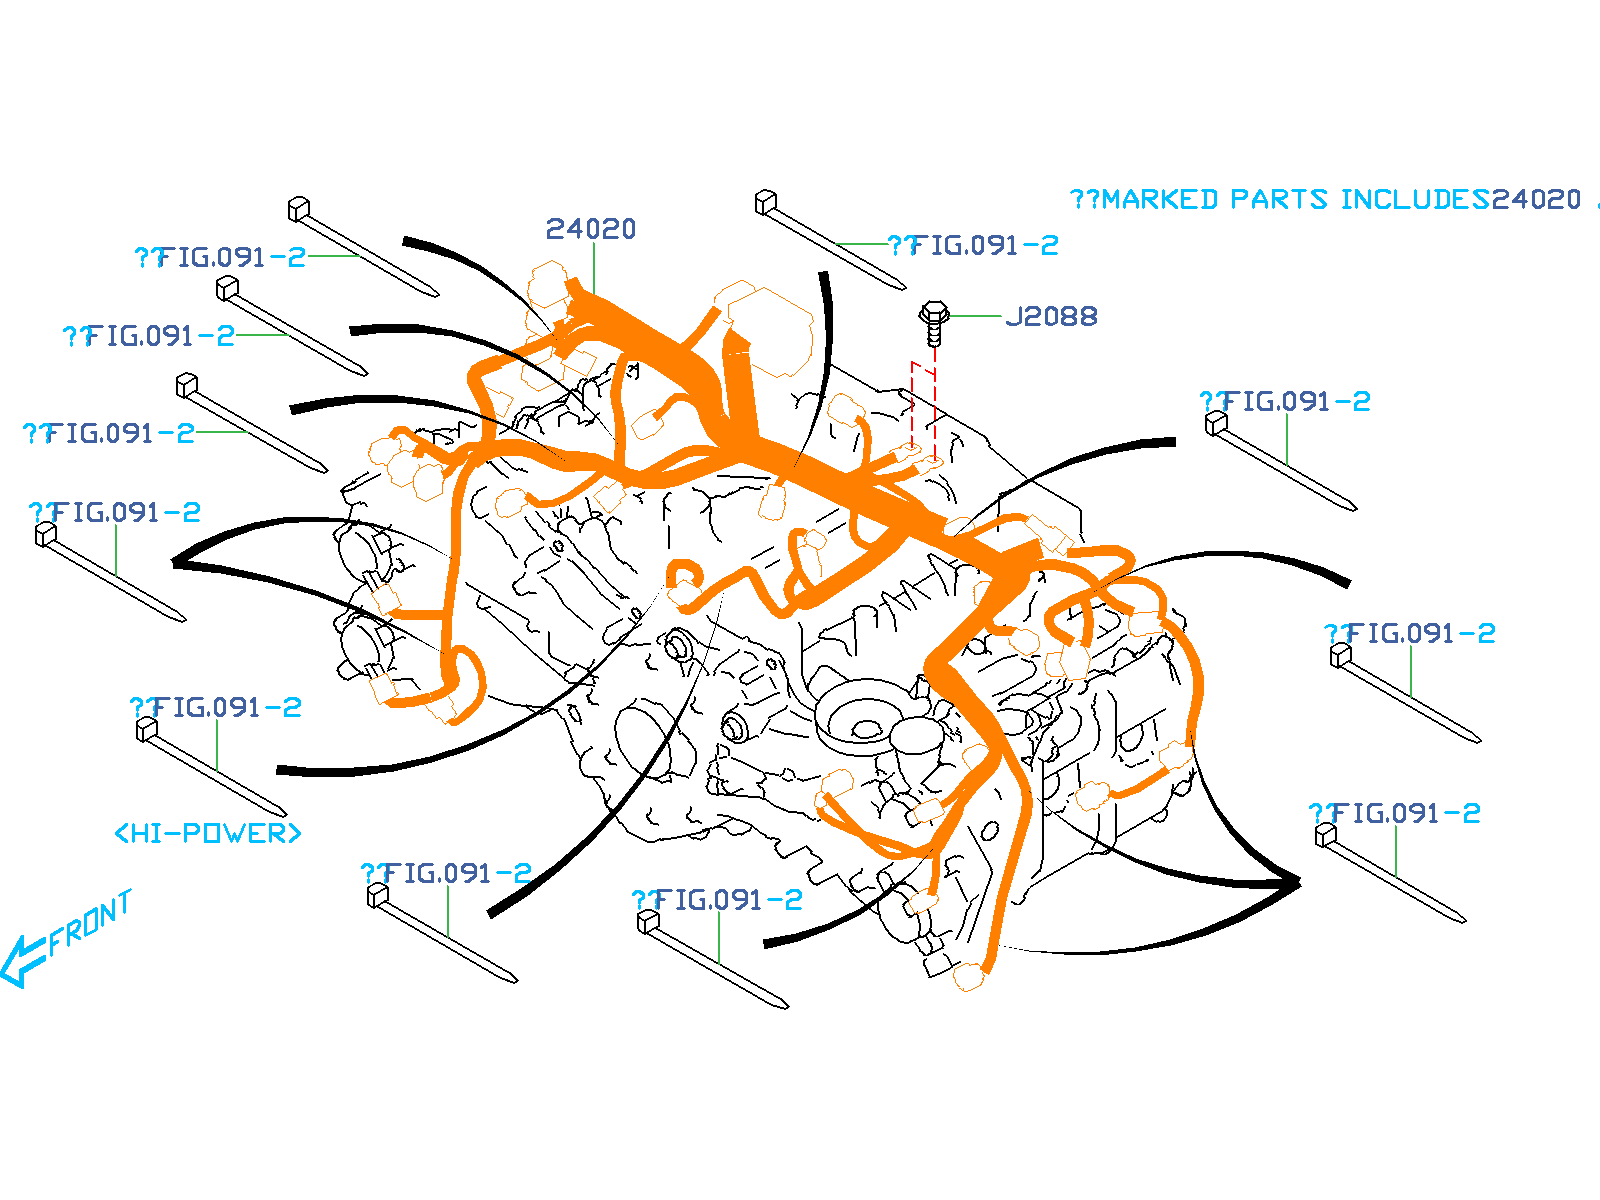 Subaru Brz Clip-band  Mt  Cvt Auto A  C   Engine  Harness  Wiring  Cooling